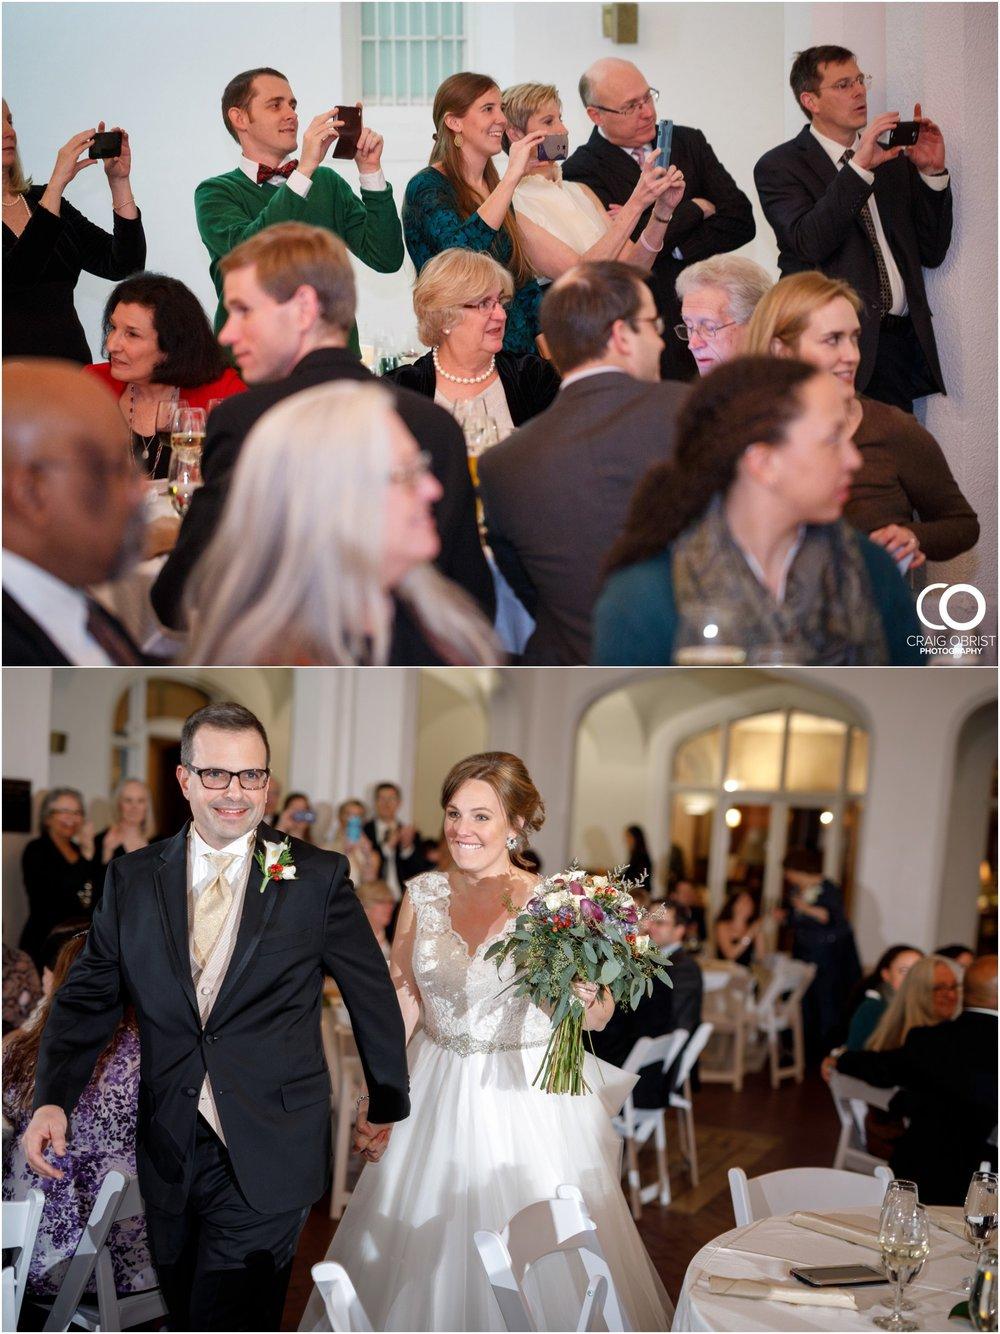 Callanwolde-Fine-Arts-Center Wedding Atlanta Georgia Dec 2017_0083.jpg